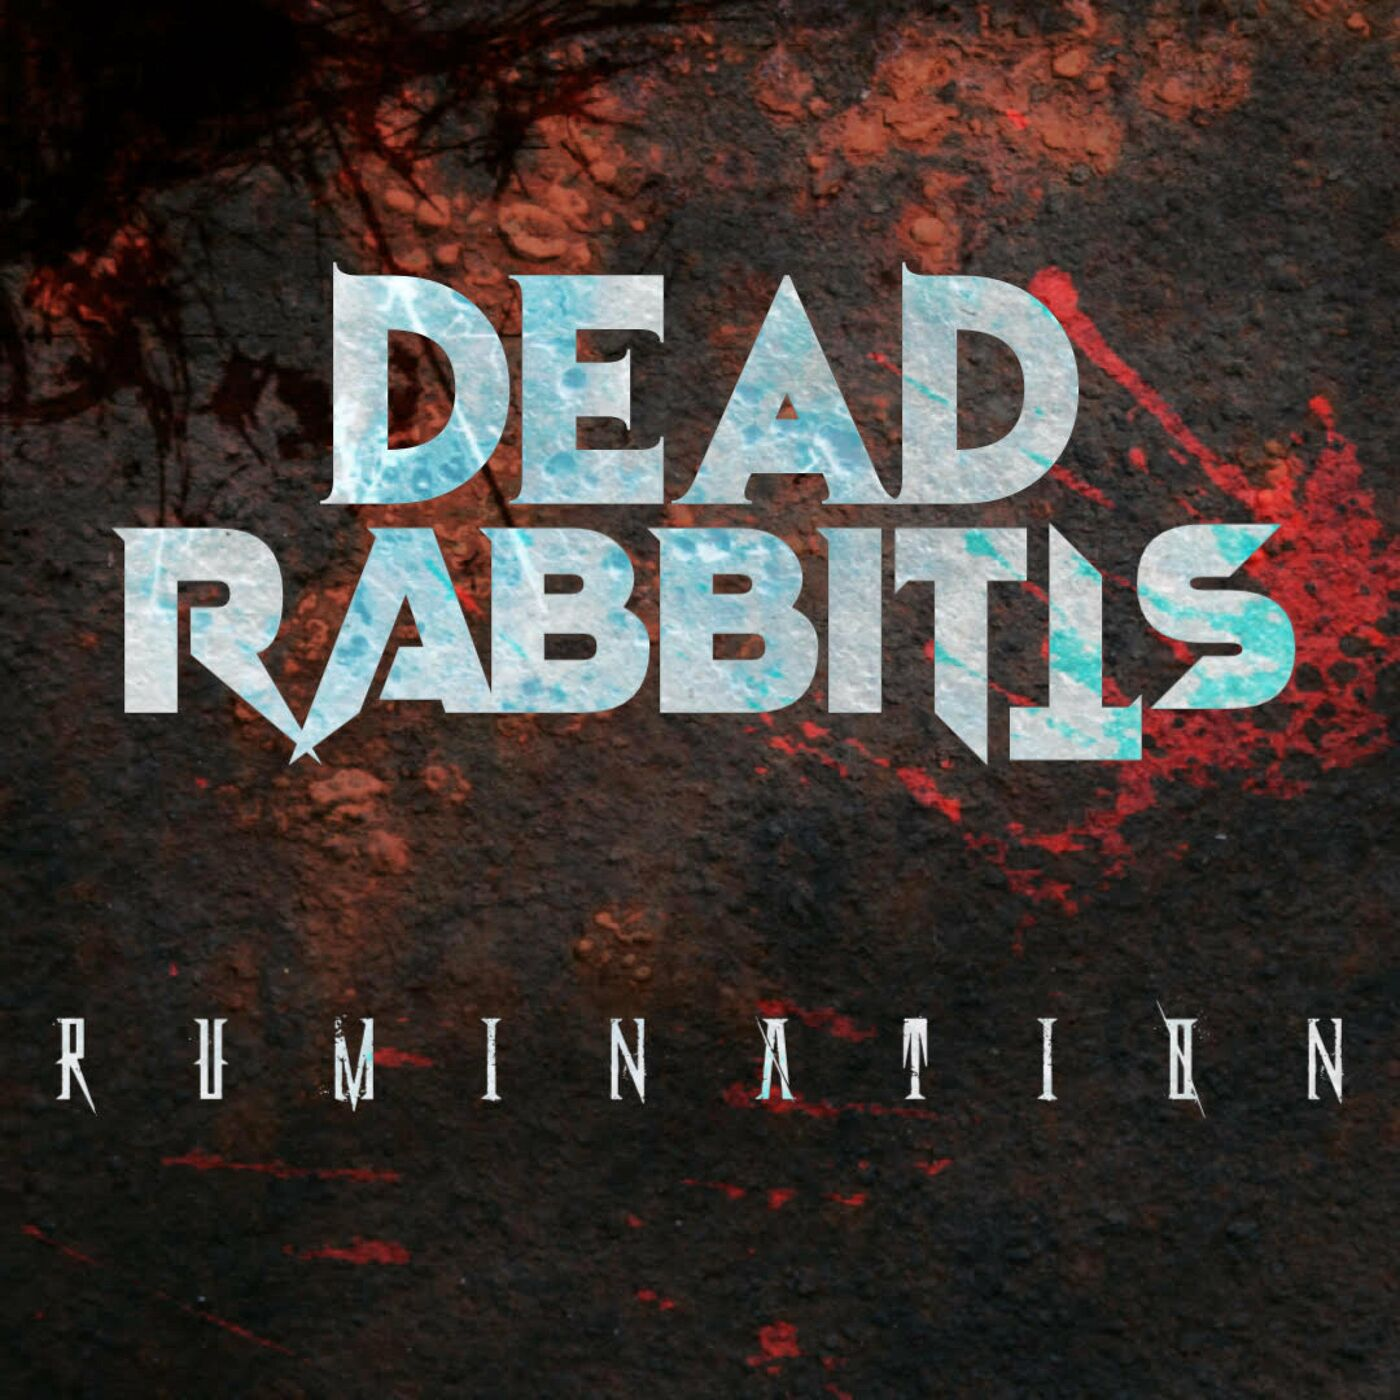 The Dead Rabbitts - Rumination [single] (2021)